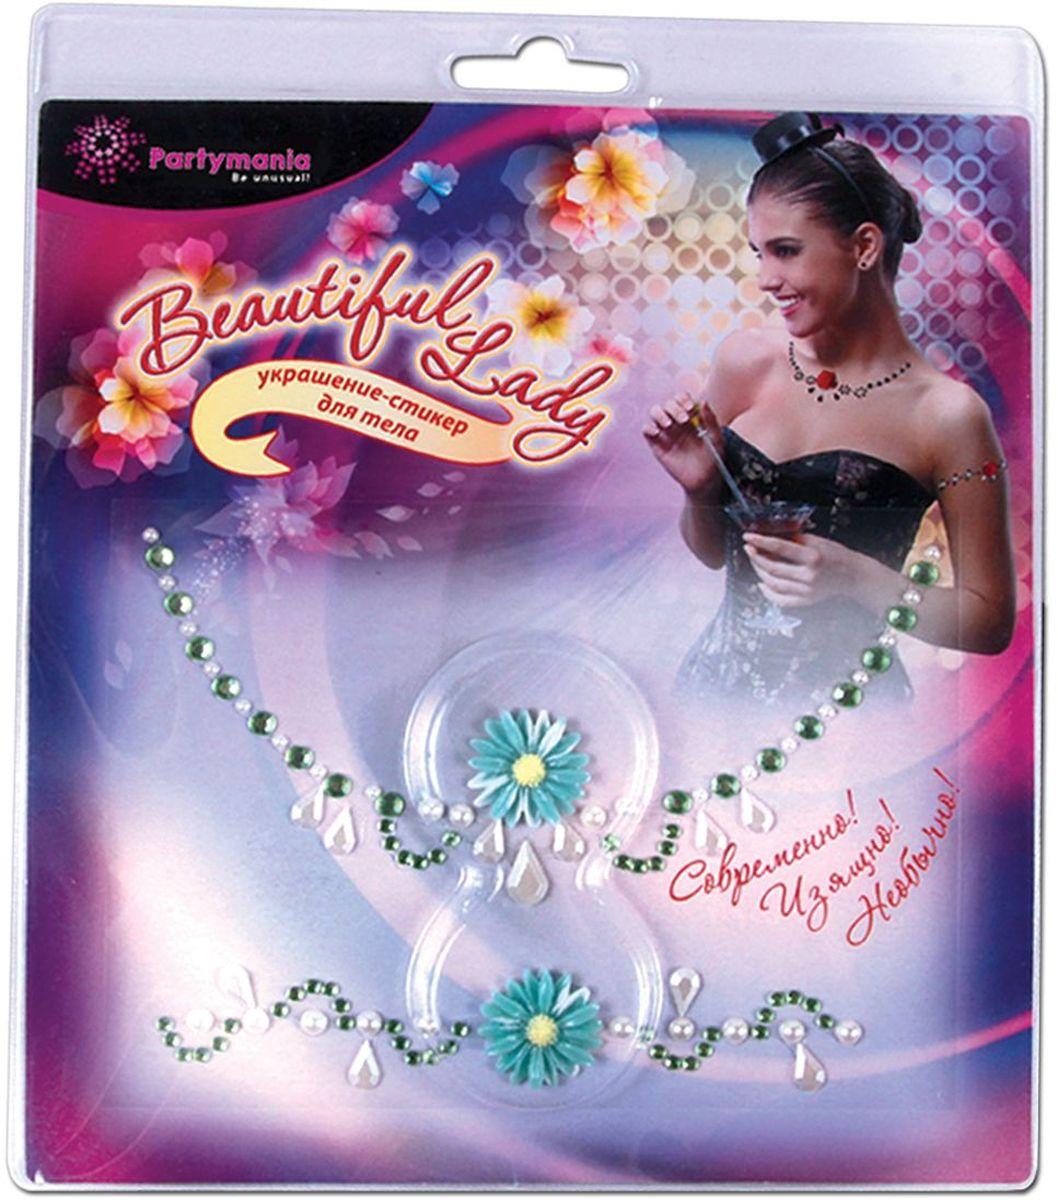 Partymania Украшение-стикер для тела 2 шт Beautiful Lady Ромашка цена